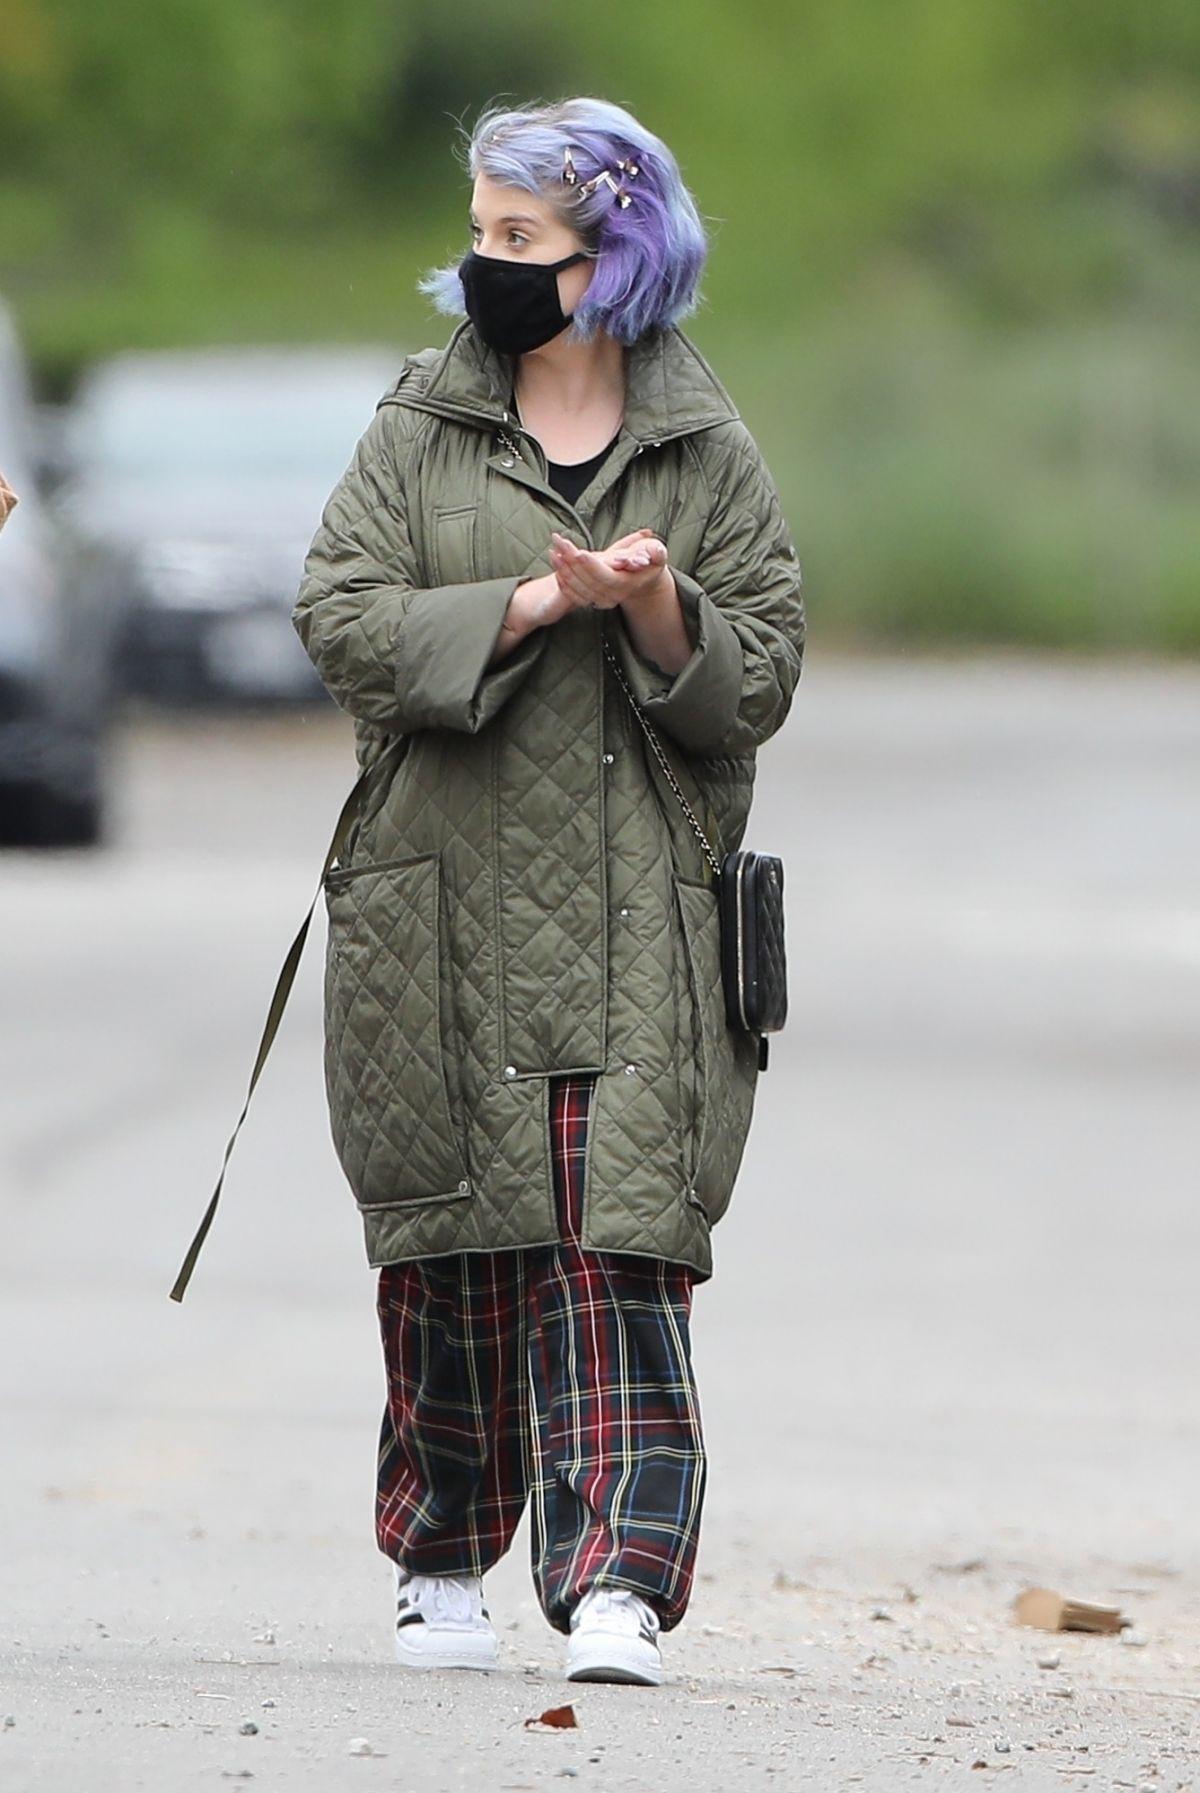 KELLY OSBOURNE Wearing Mask Out in Los Angeles 04/10/2020 ...Kelly Osbourne 2020 Picture